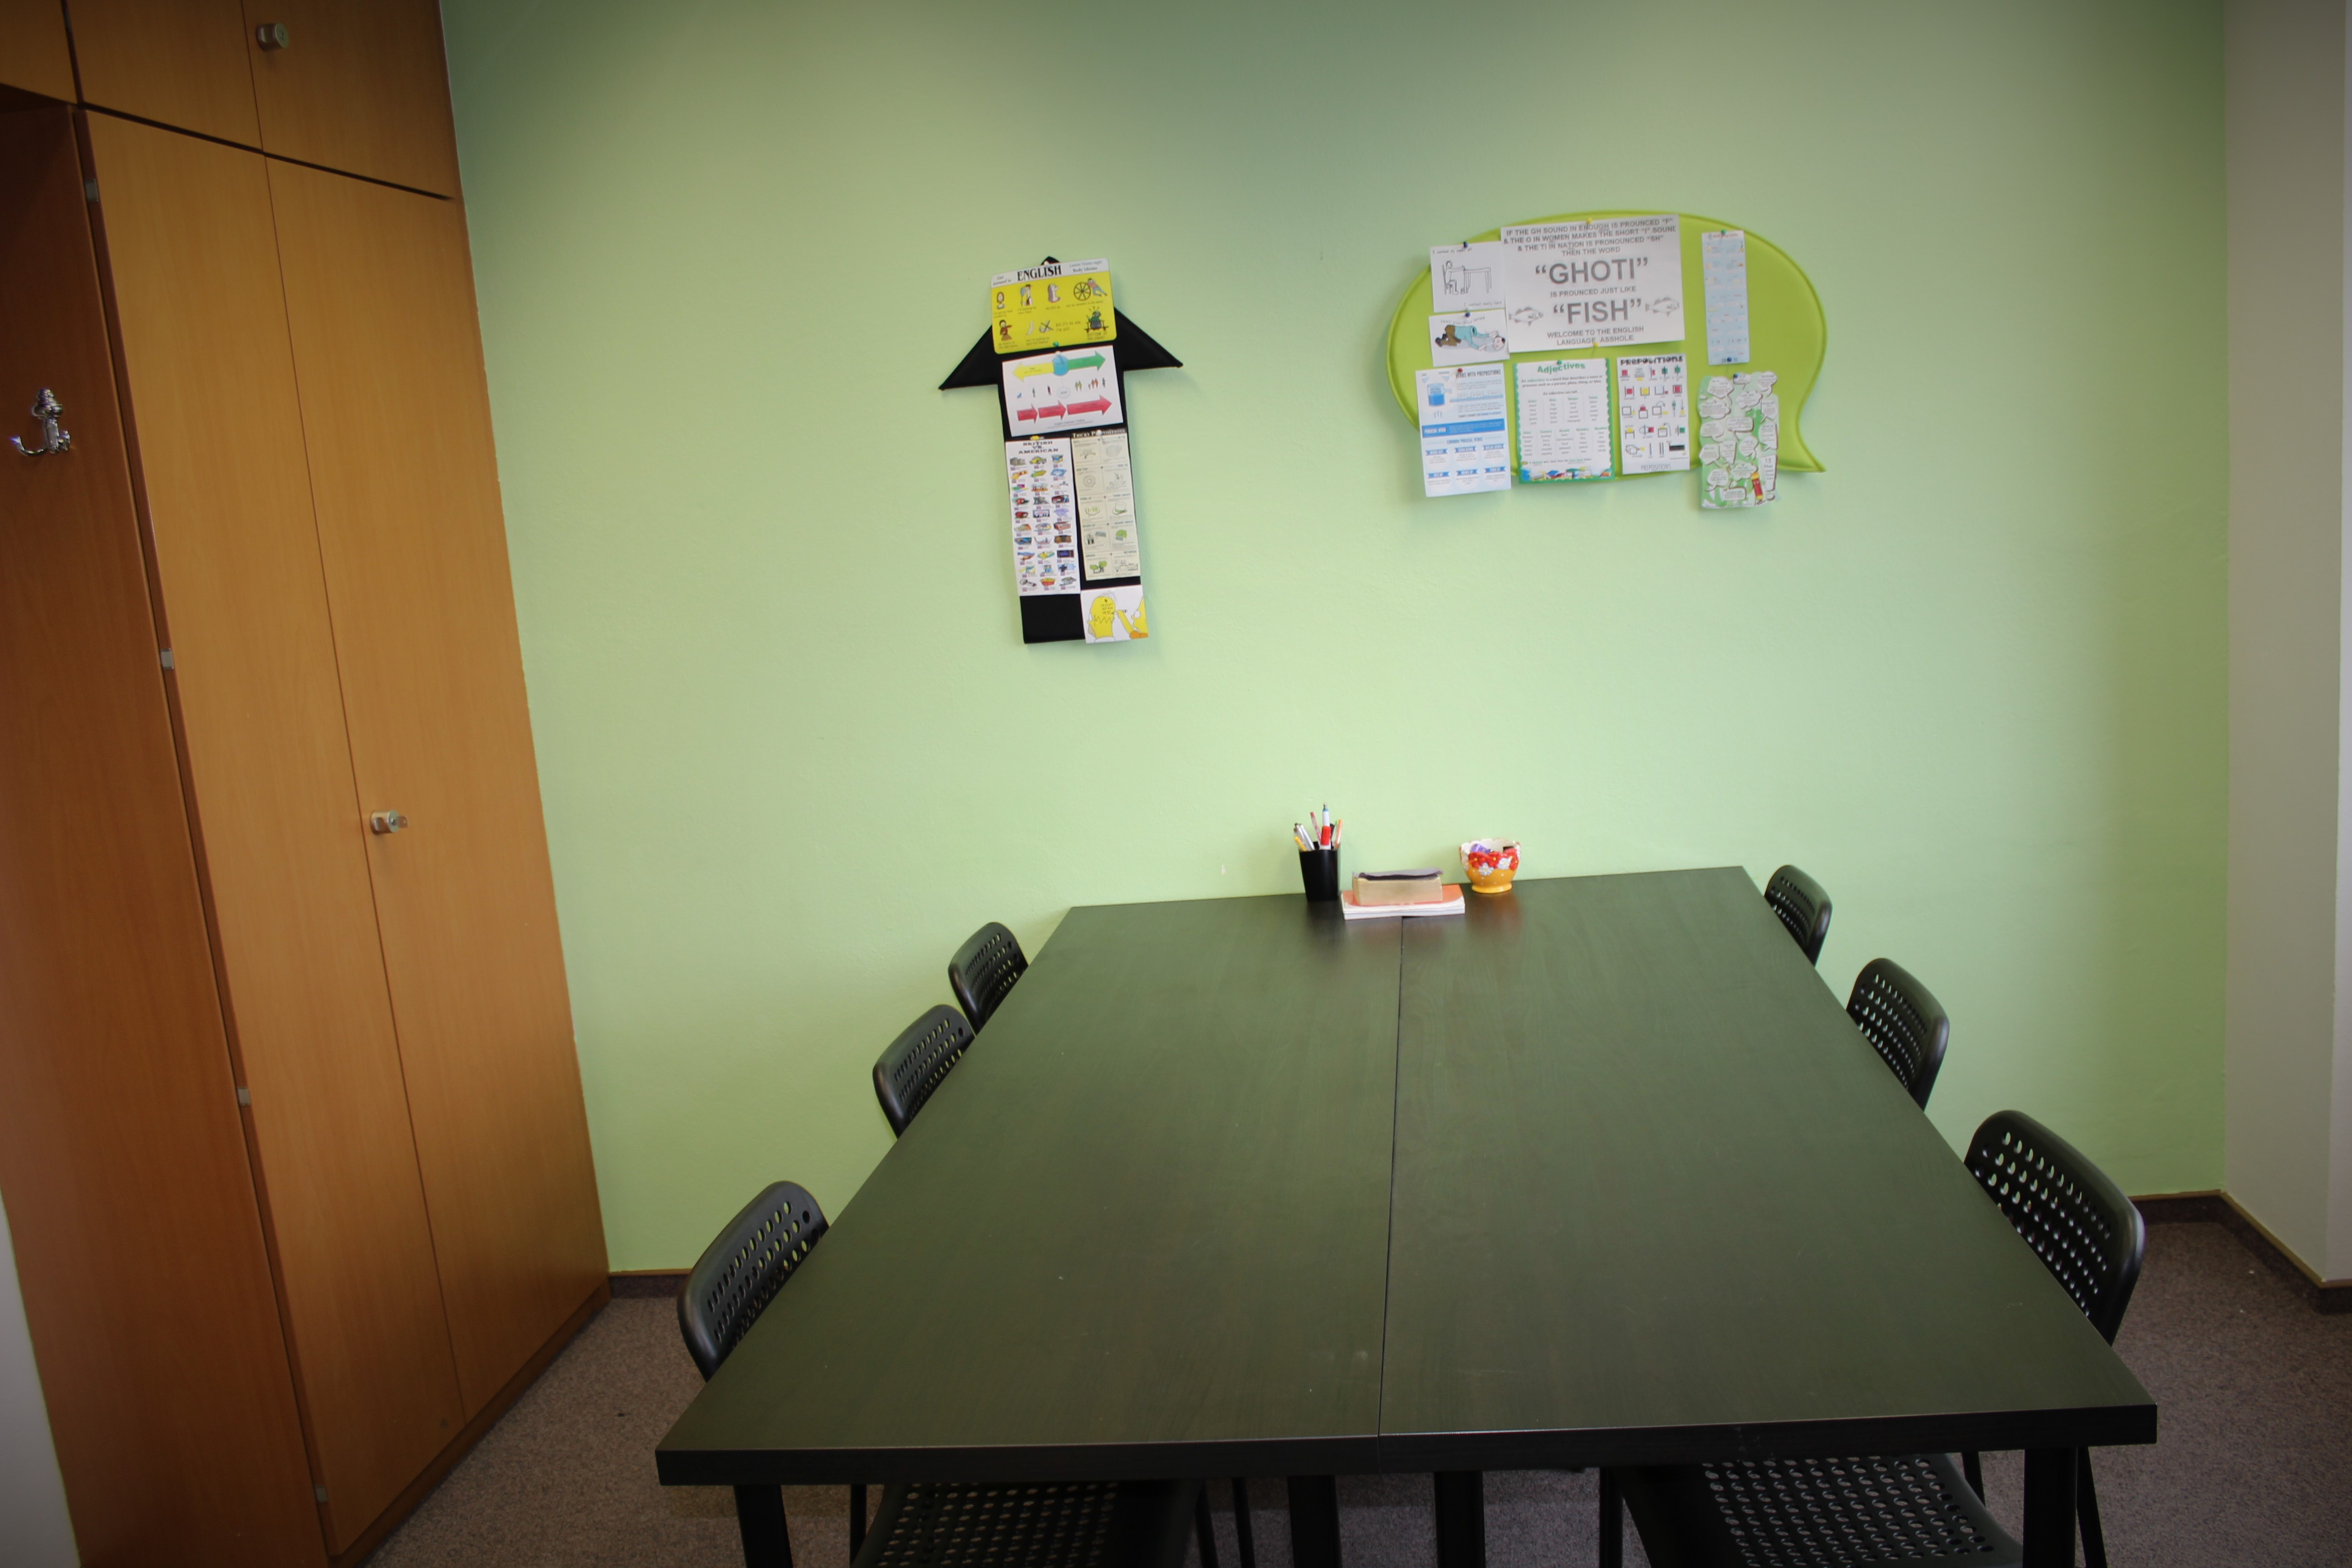 jazykova skola Flying Solutions Bratislava miestnost na vyucbu anglickeho jazyka Spitalska 2256/61